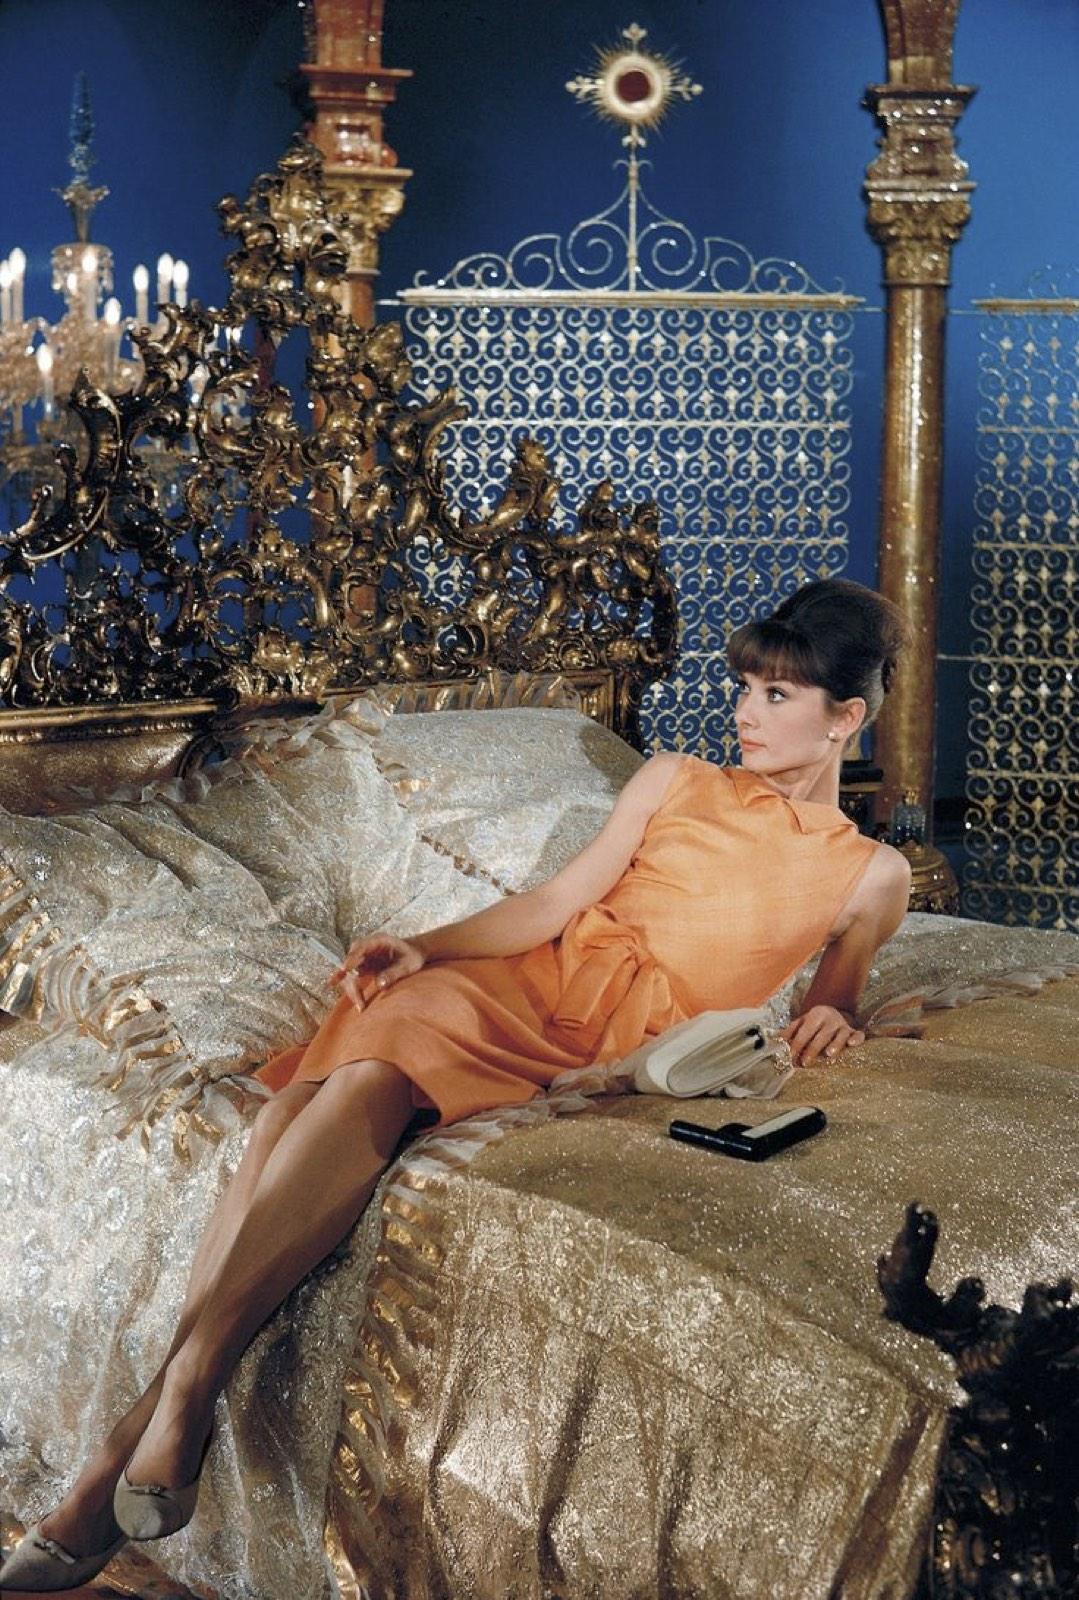 Audrey-Hepburn-in-Paris-When-It-Sizzles